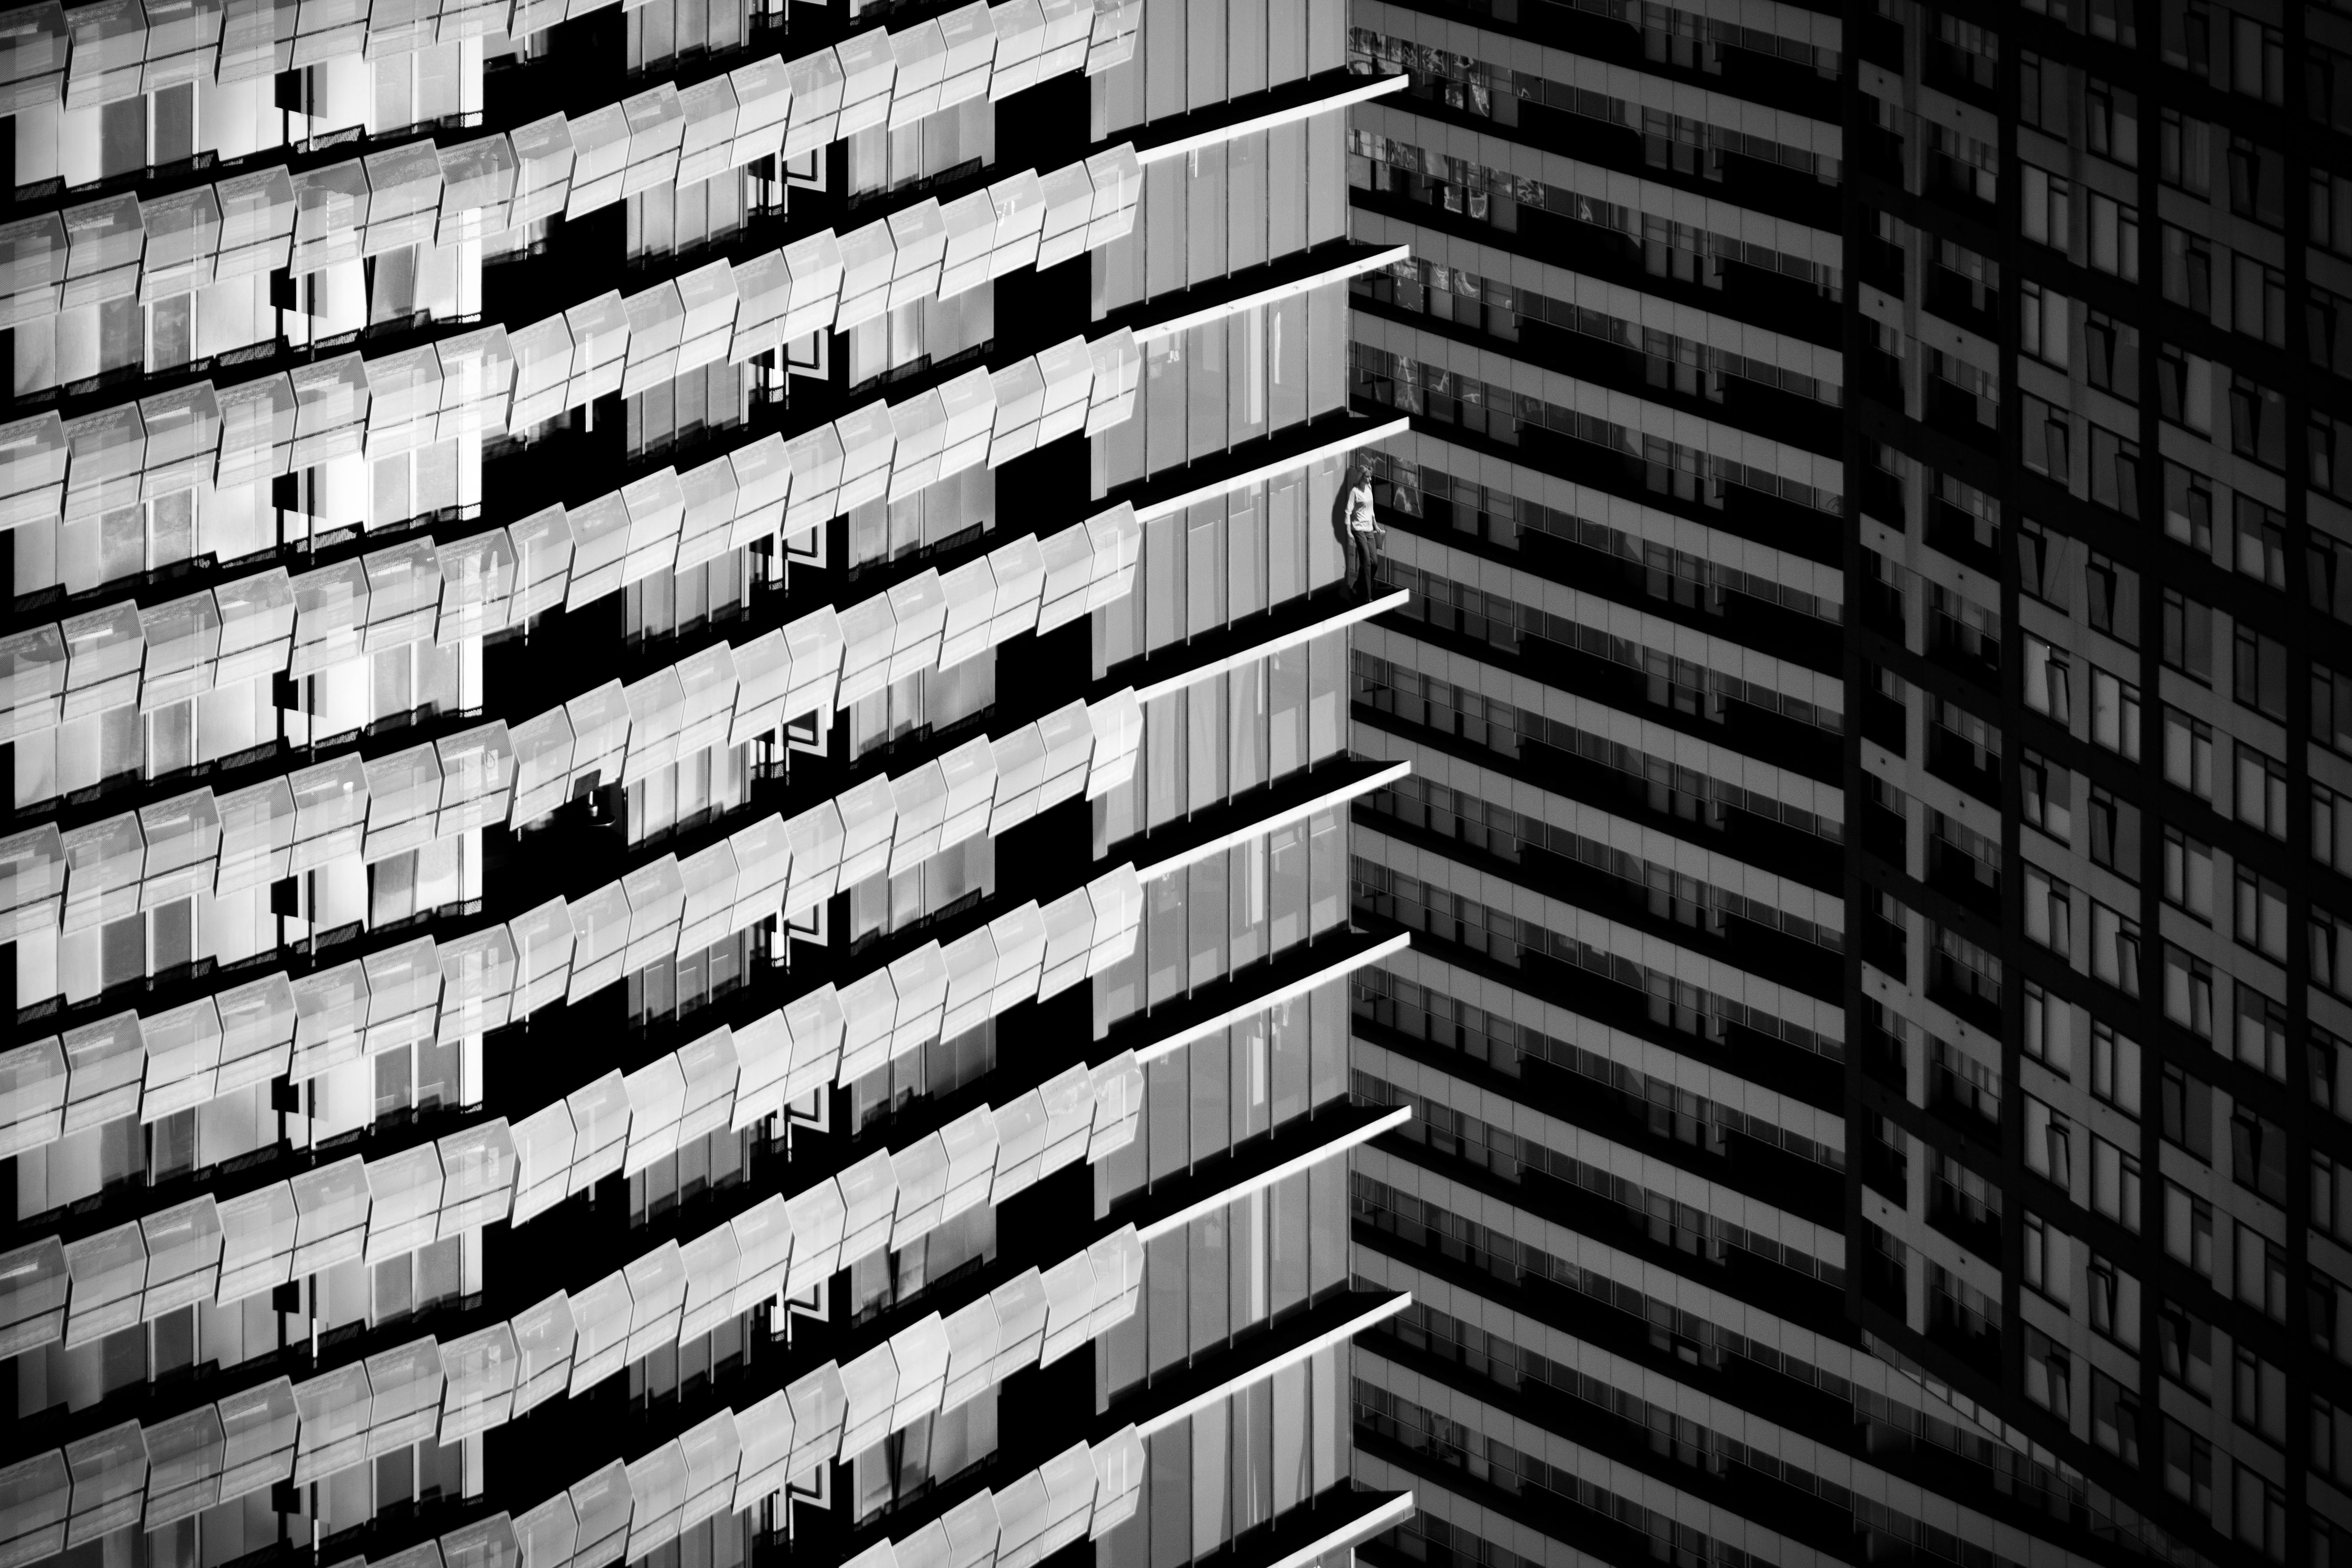 Architectural-Photography-Darwin-Gary-Annett-16